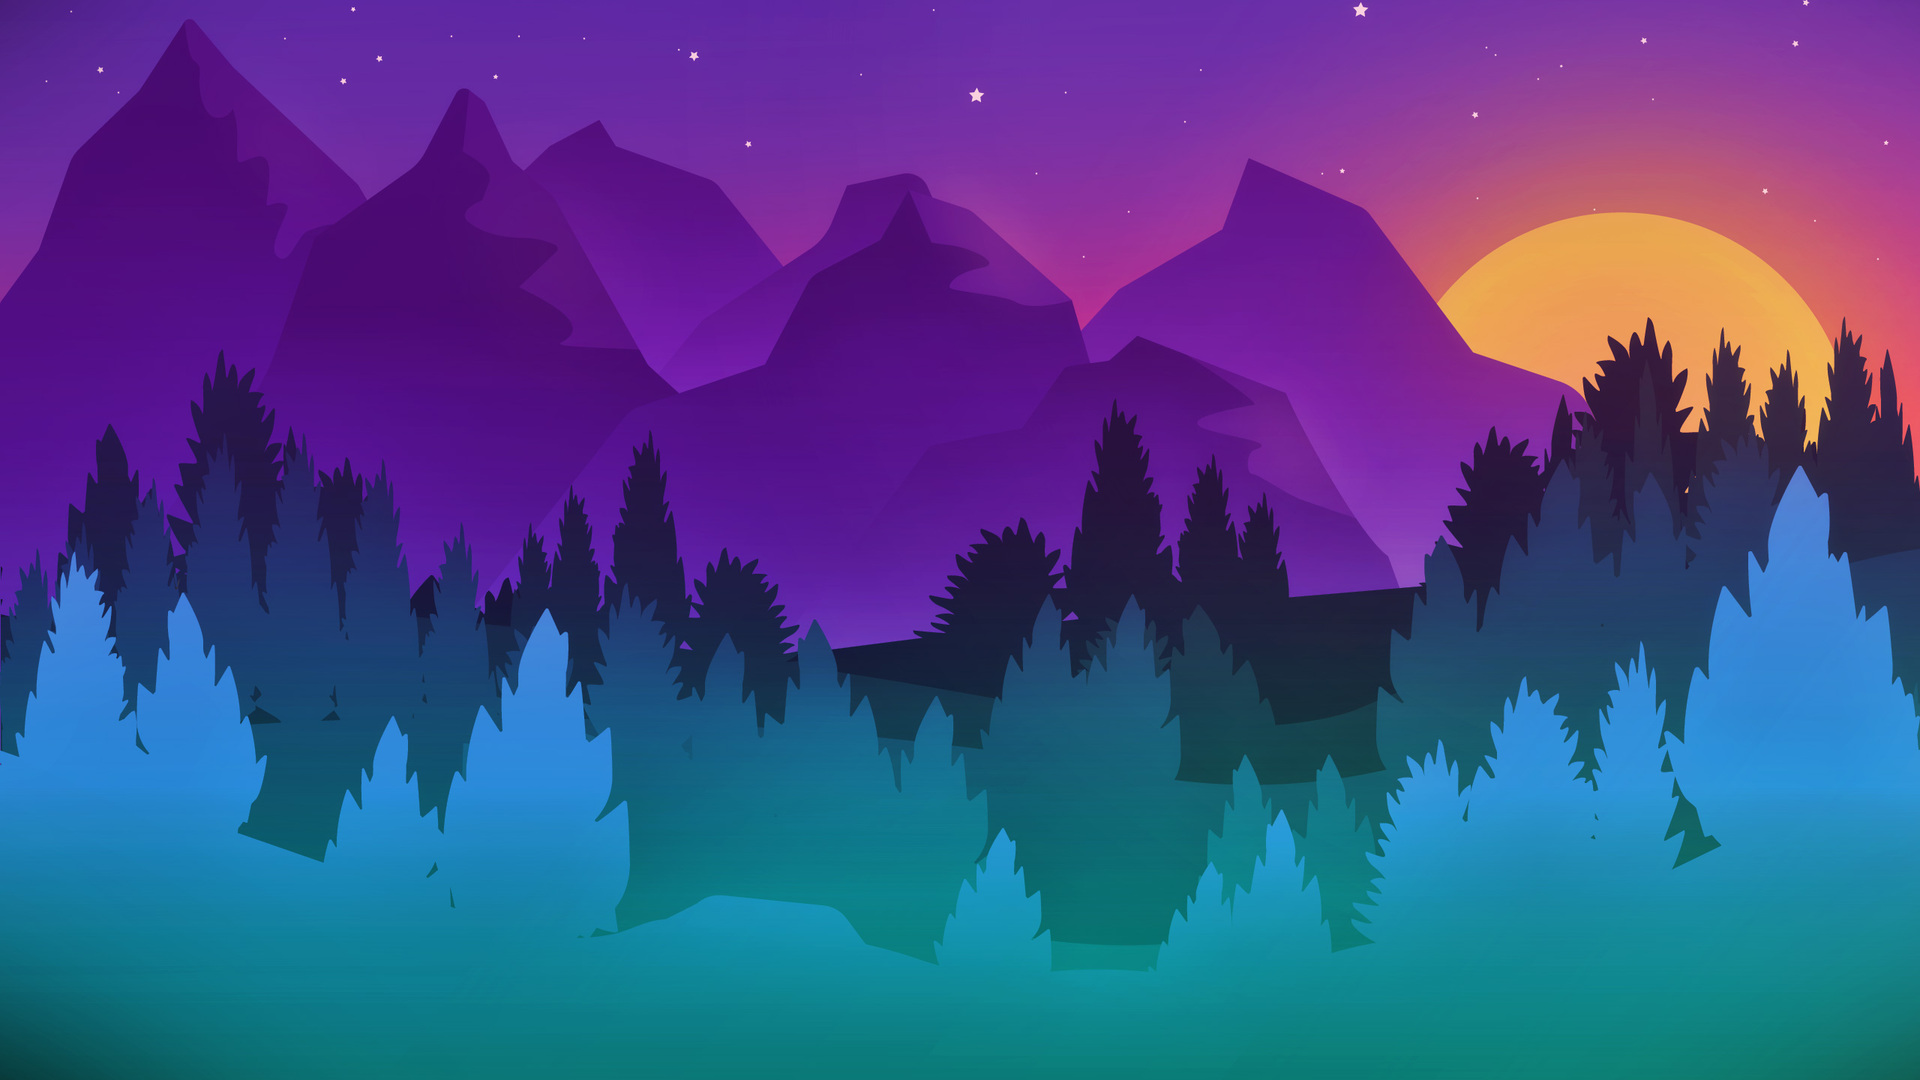 1920x1080 Stars Mountains Trees Colorful Minimalist ...